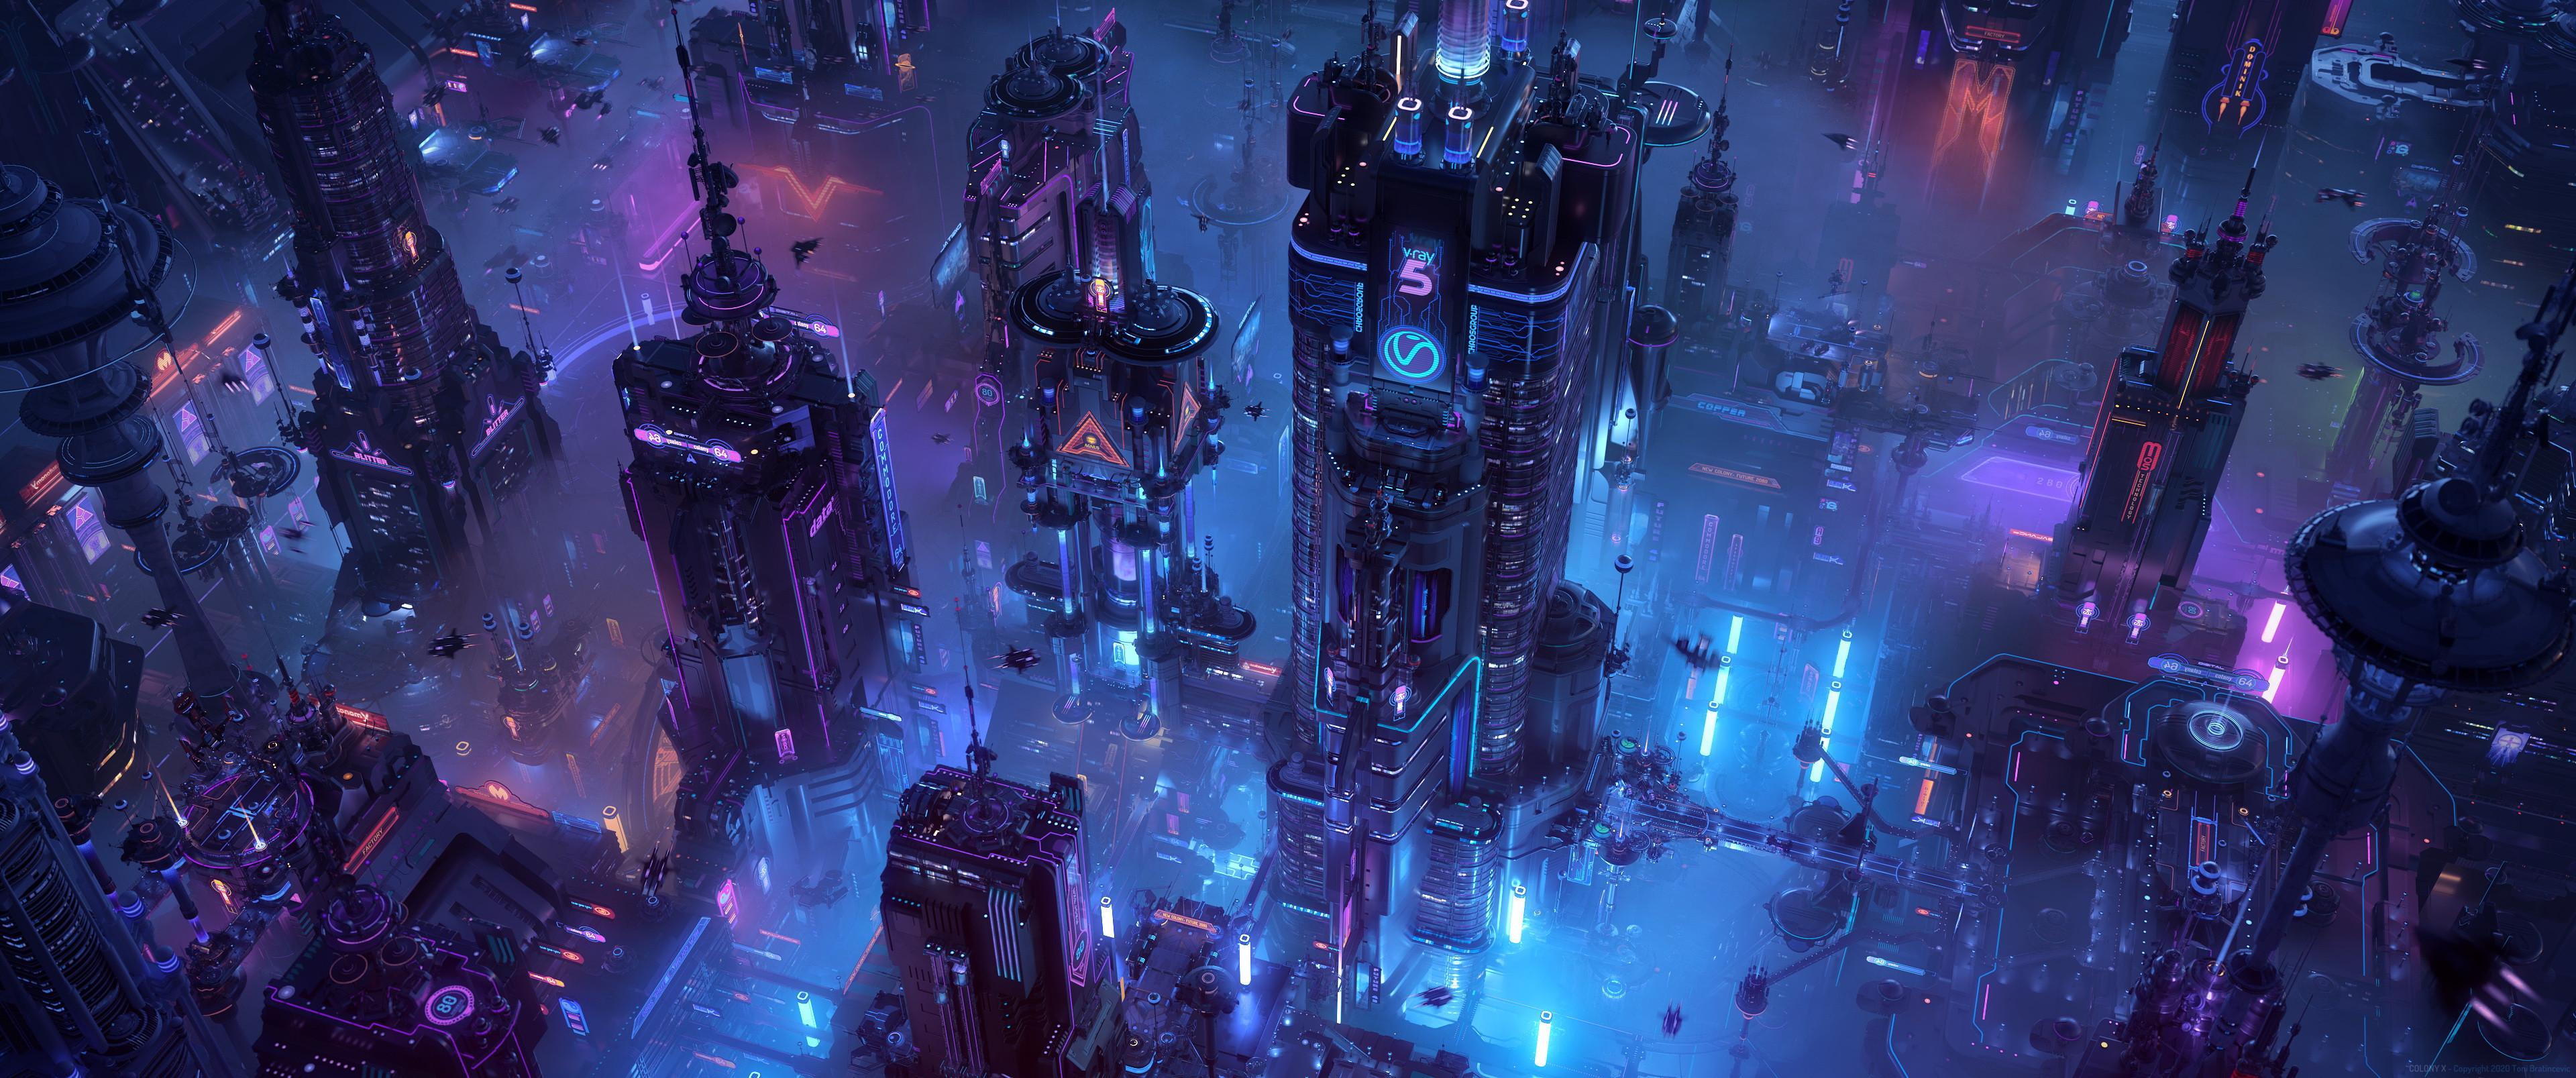 General 3840x1607 render CGI digital art science fiction futuristic city